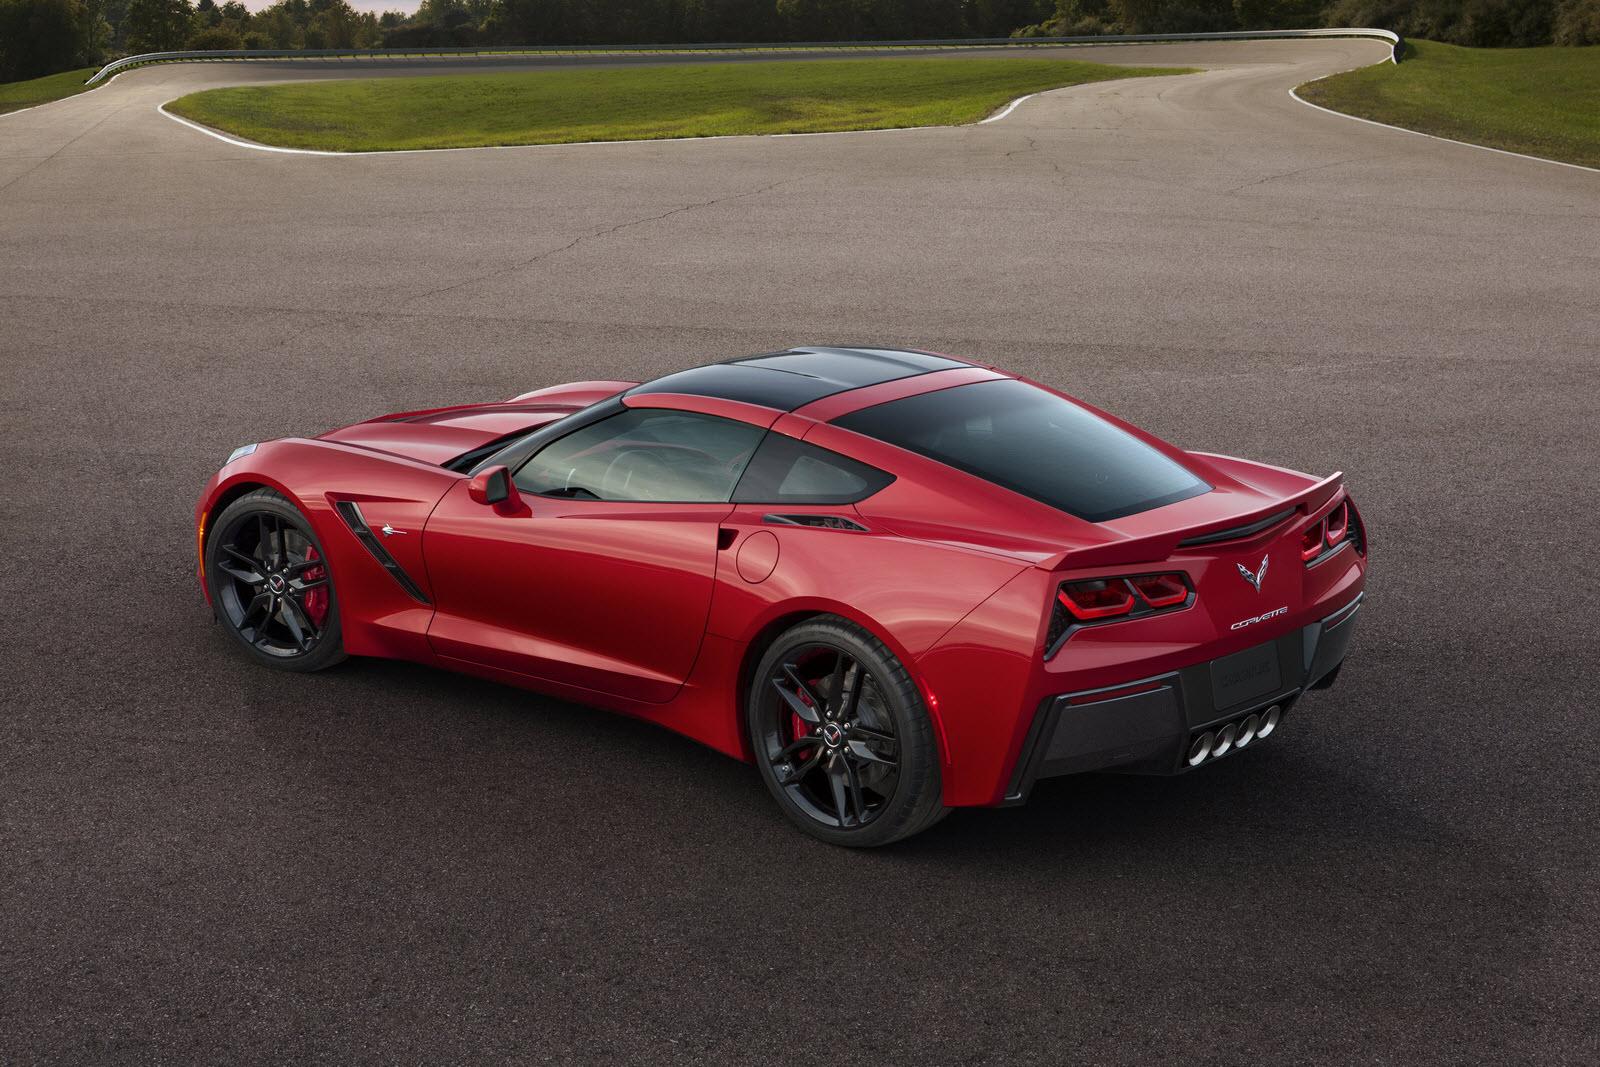 http://3.bp.blogspot.com/-SCPej8p0o3s/UPPNkCRcBBI/AAAAAAABToQ/19OTLZigPhg/s1600/2014_C-Corvette-Stingray_04.jpg